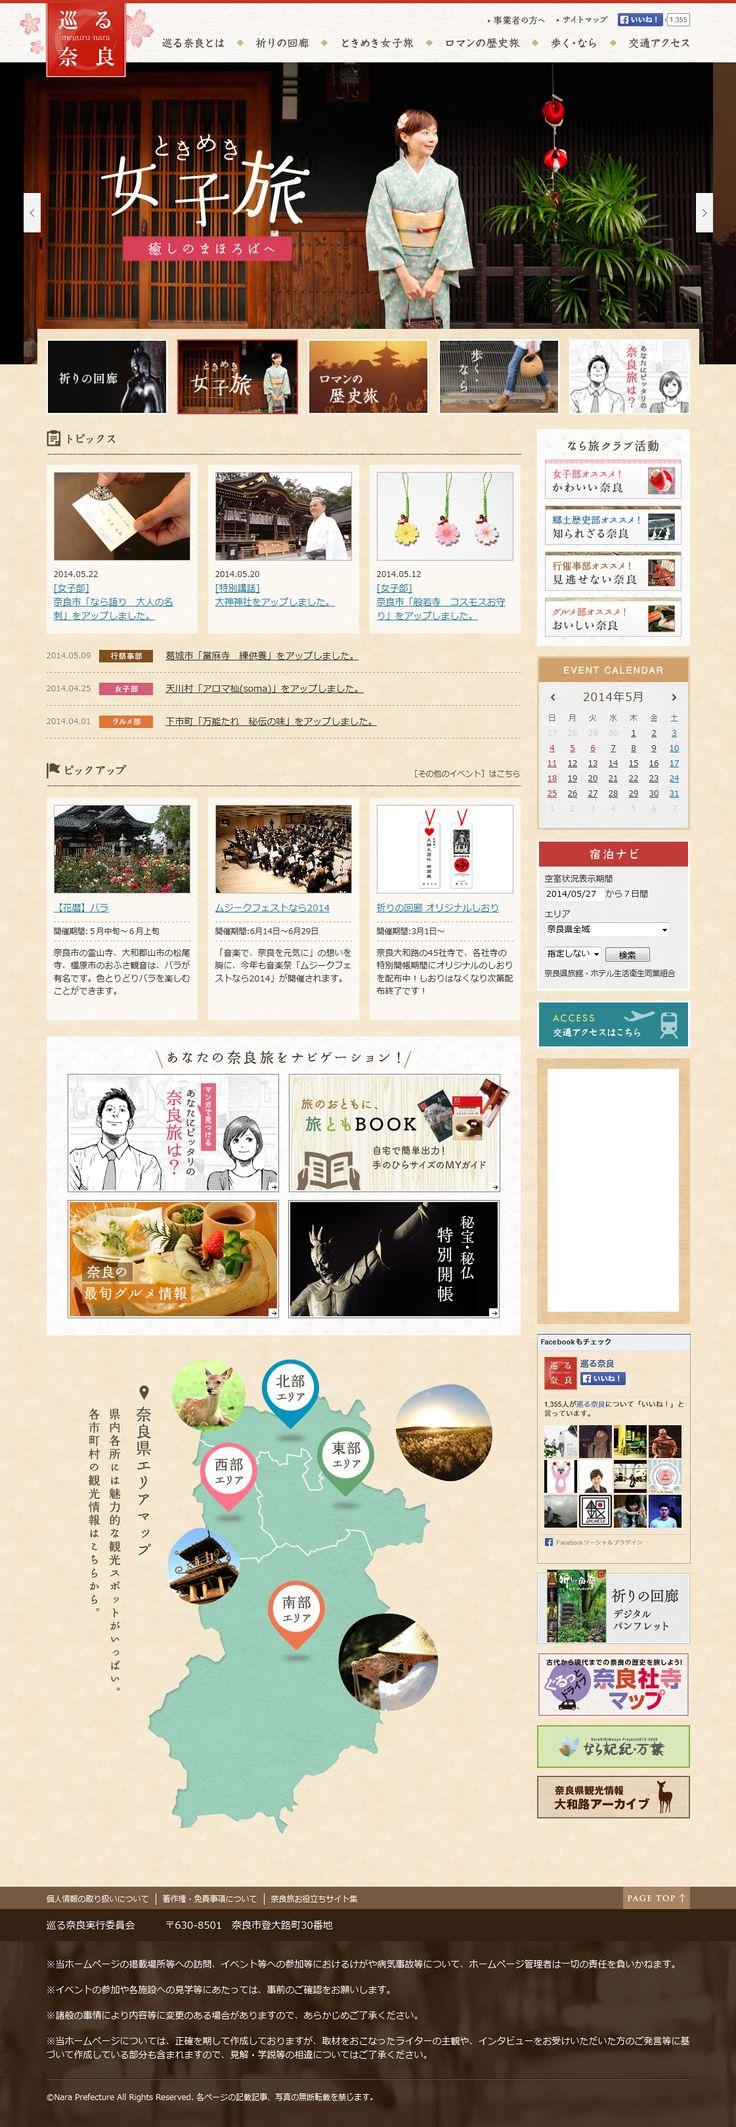 巡る奈良 http://www3.pref.nara.jp/miryoku/megurunara/